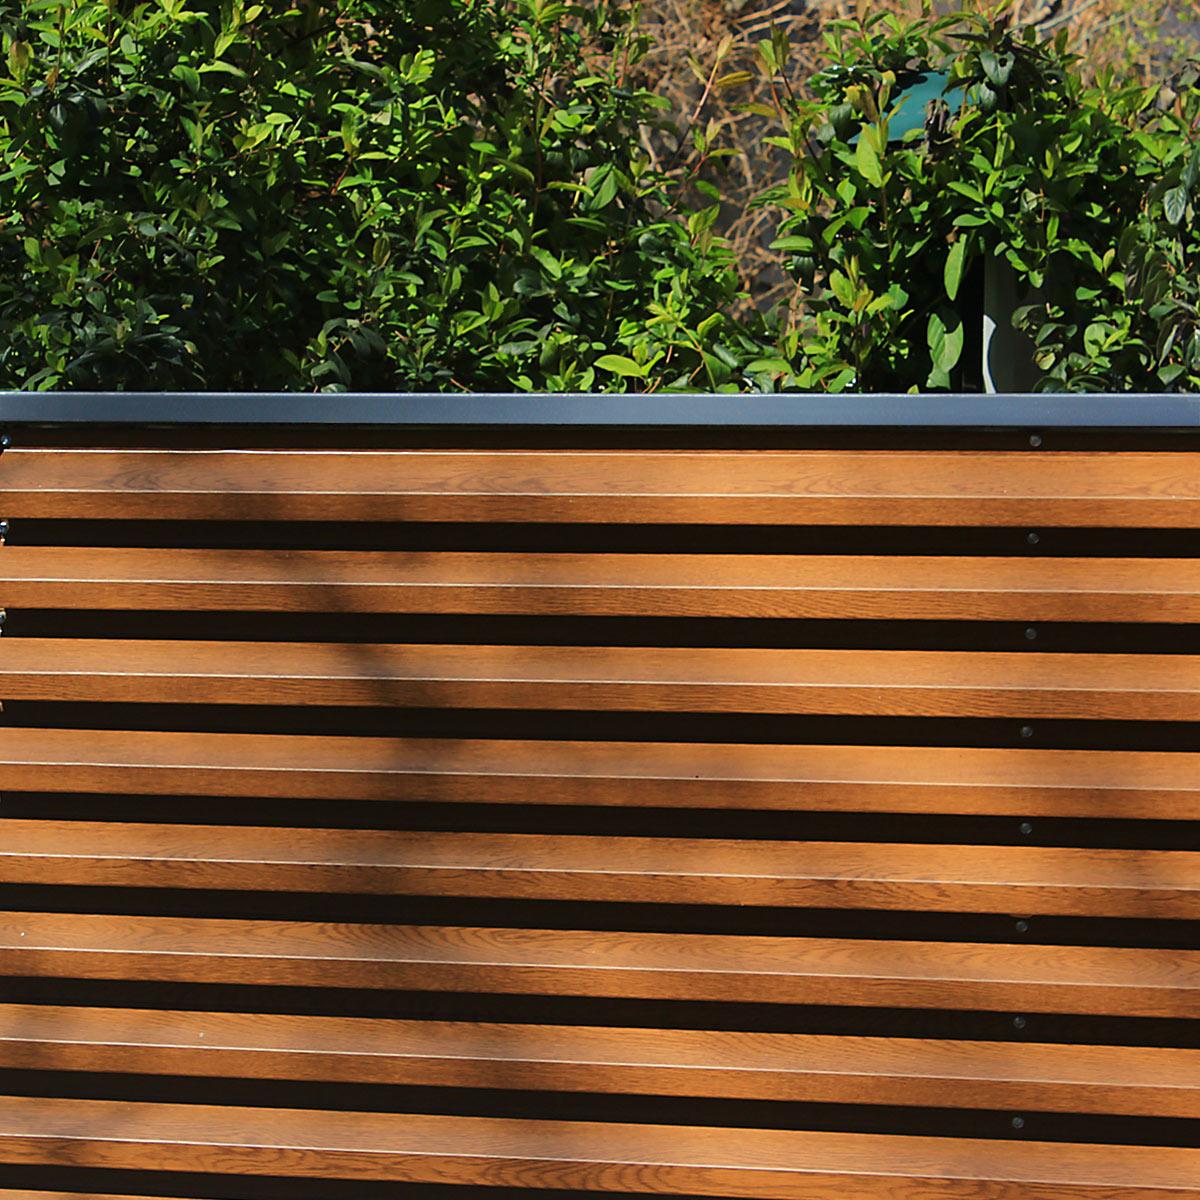 Gard metalic din panouri de tabla zincata imitatie lemn